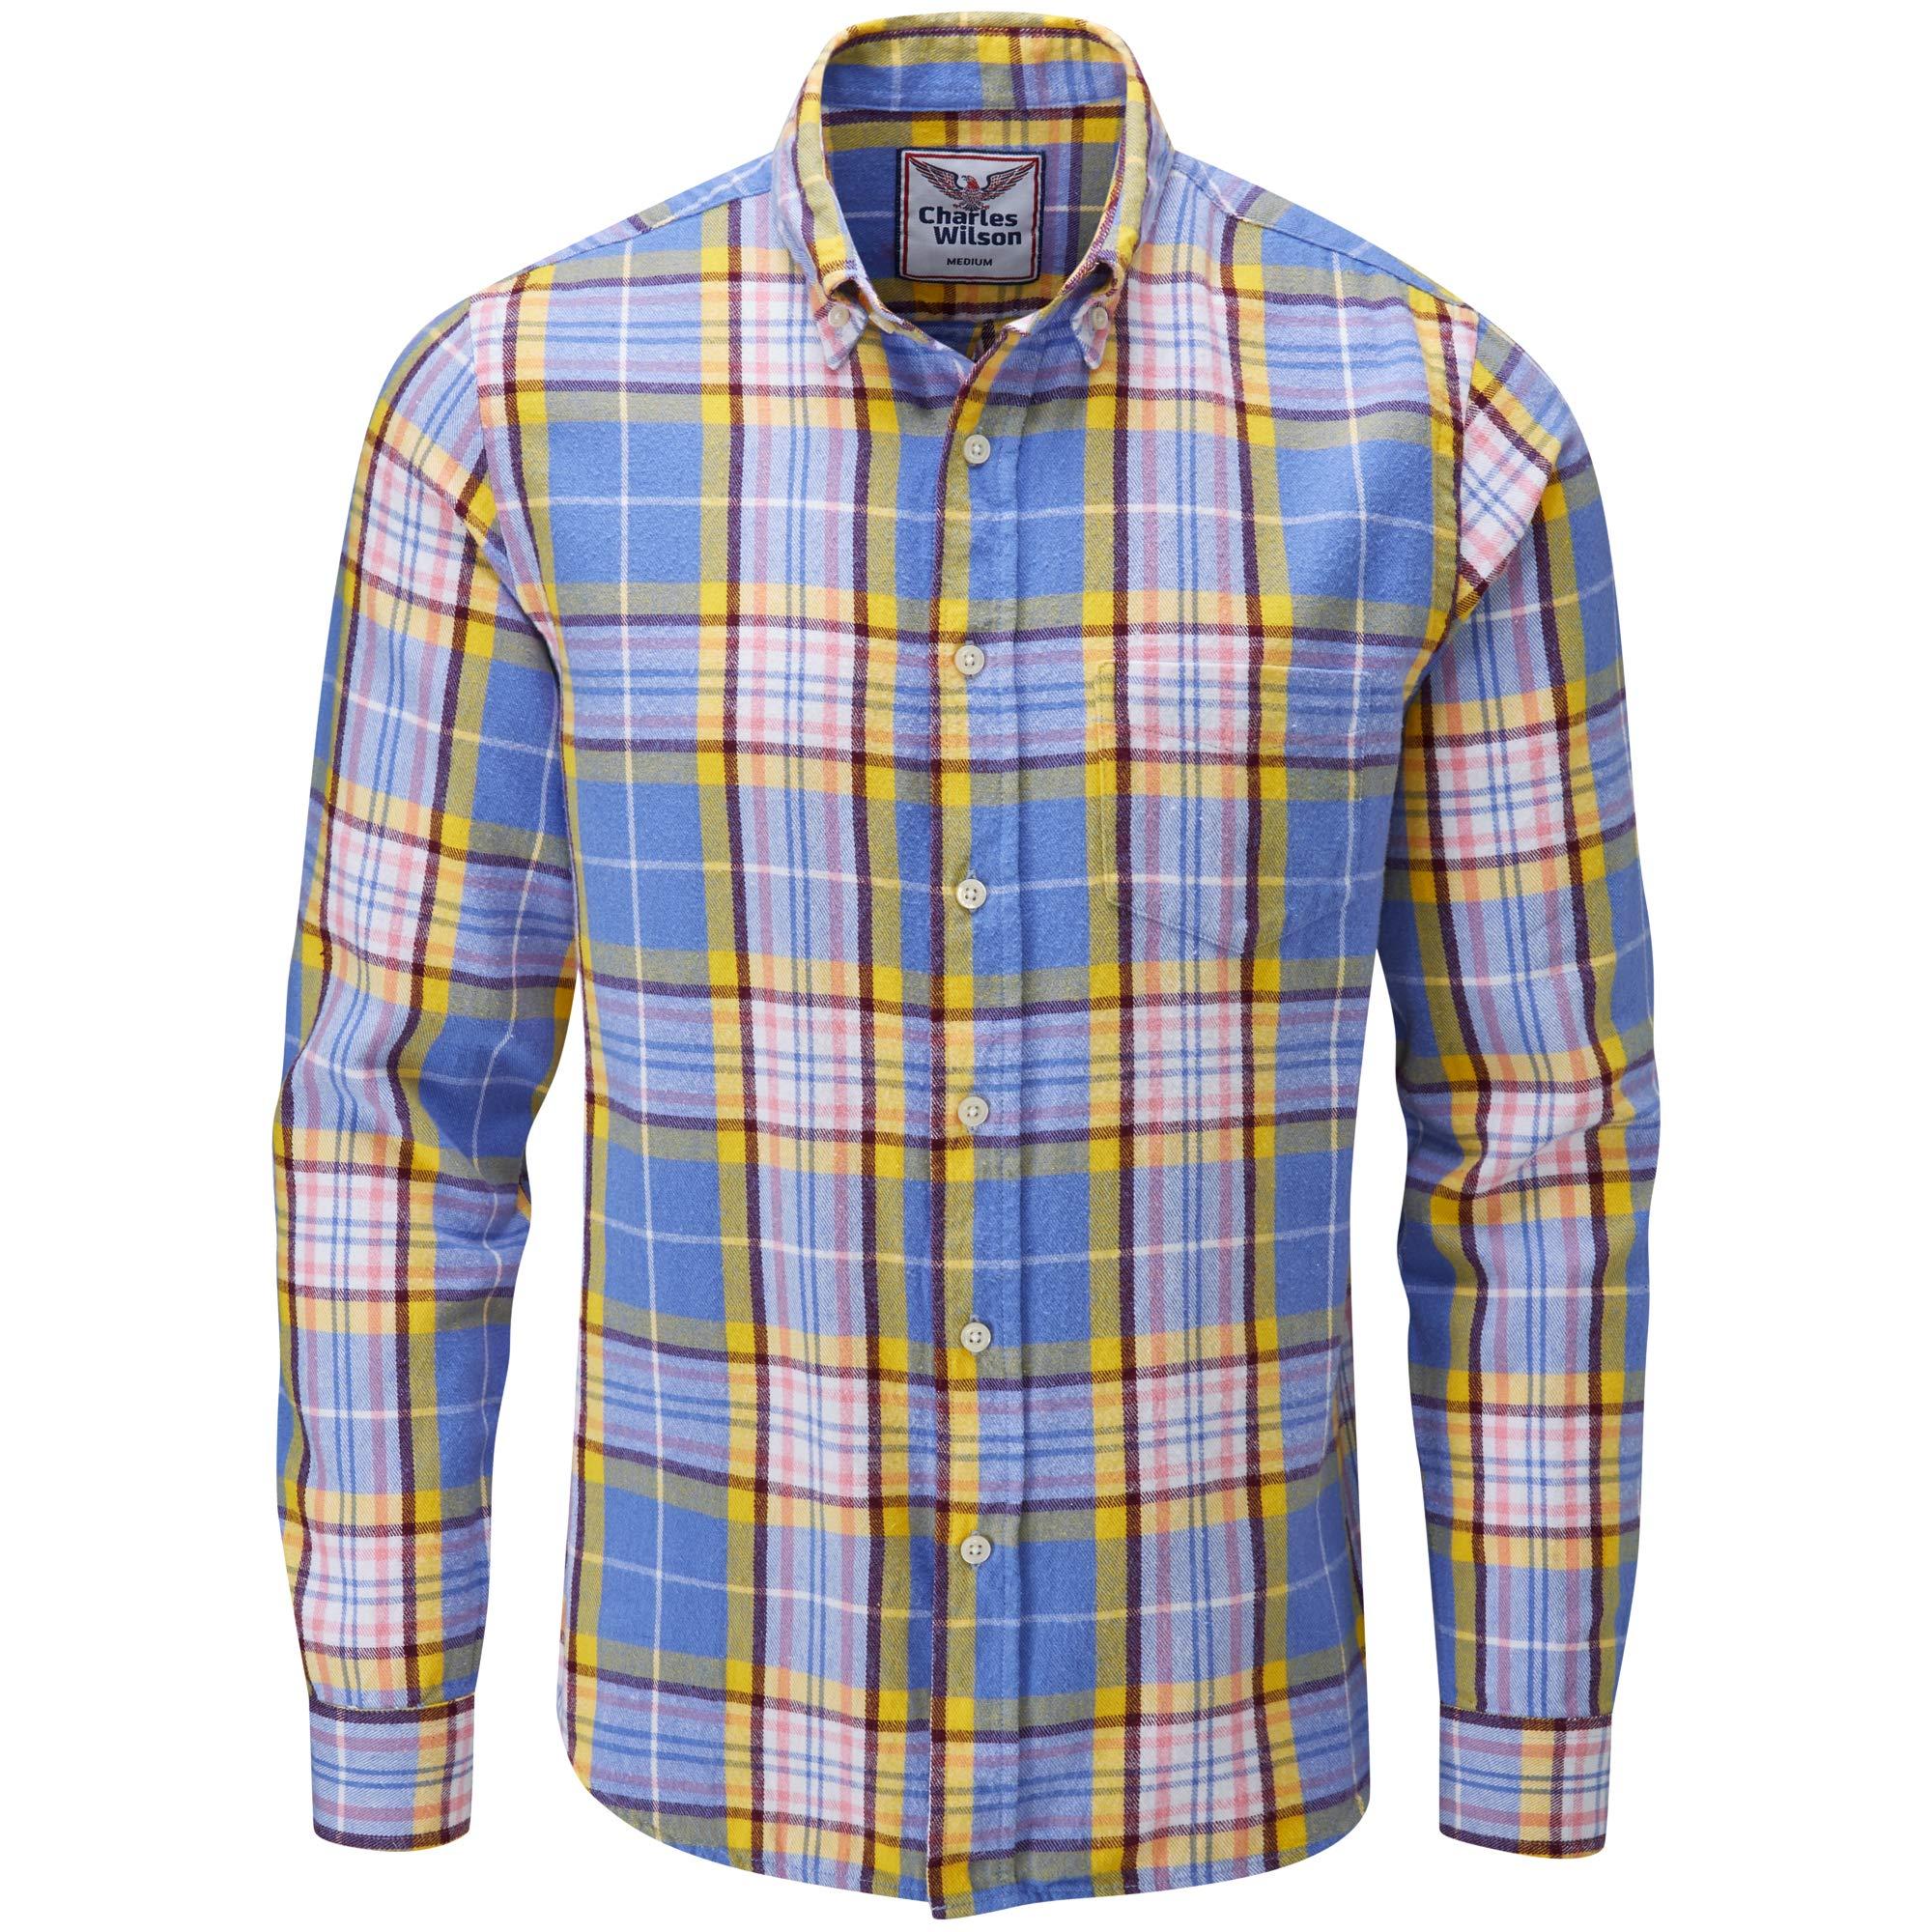 92823a8462 Charles Wilson Camisa Franela de Cuadros Manga Larga para Hombre product  image